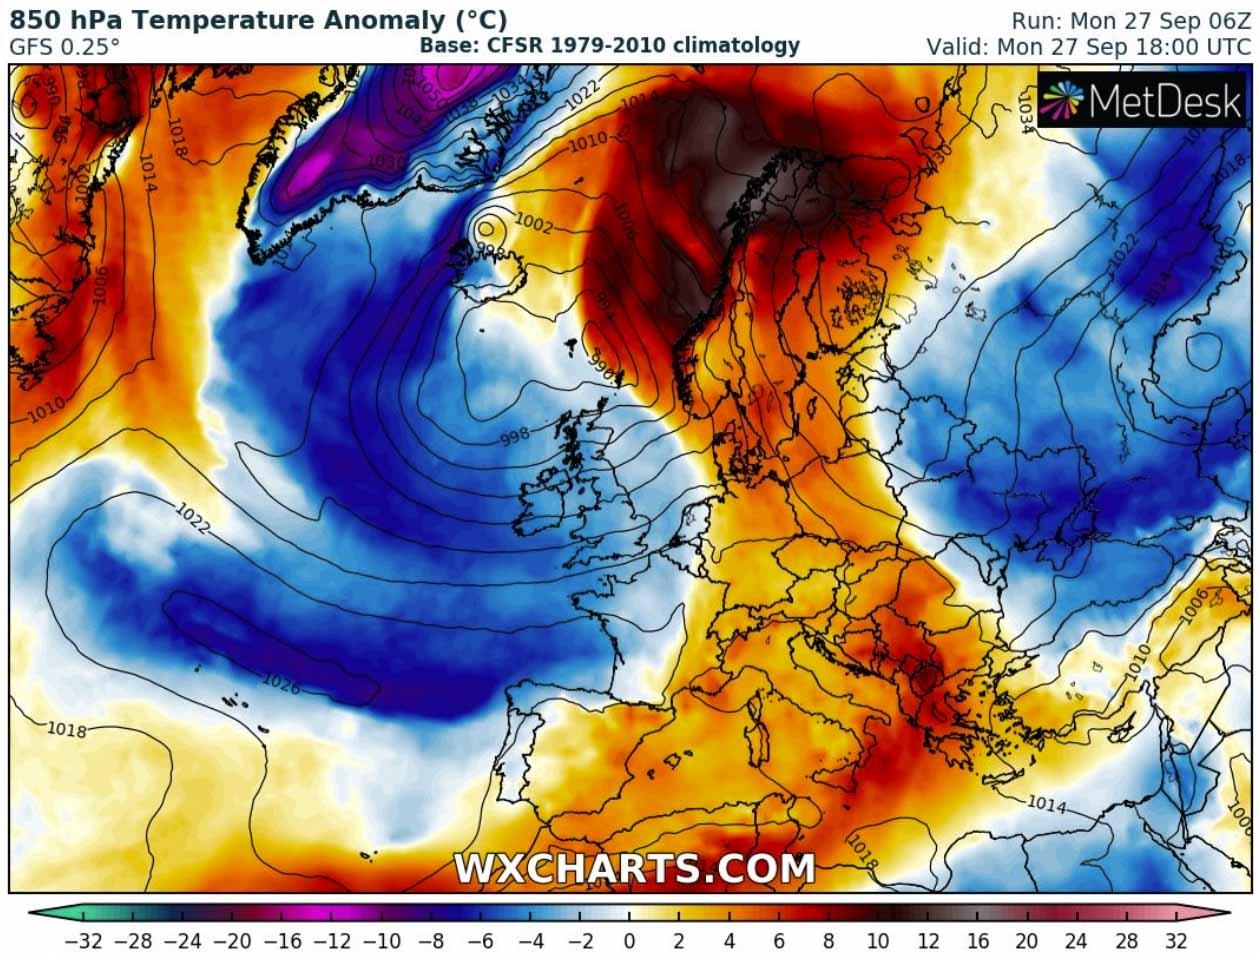 north-atlantic-cold-pool-uk-ireland-snow-iceland-temperature-monday